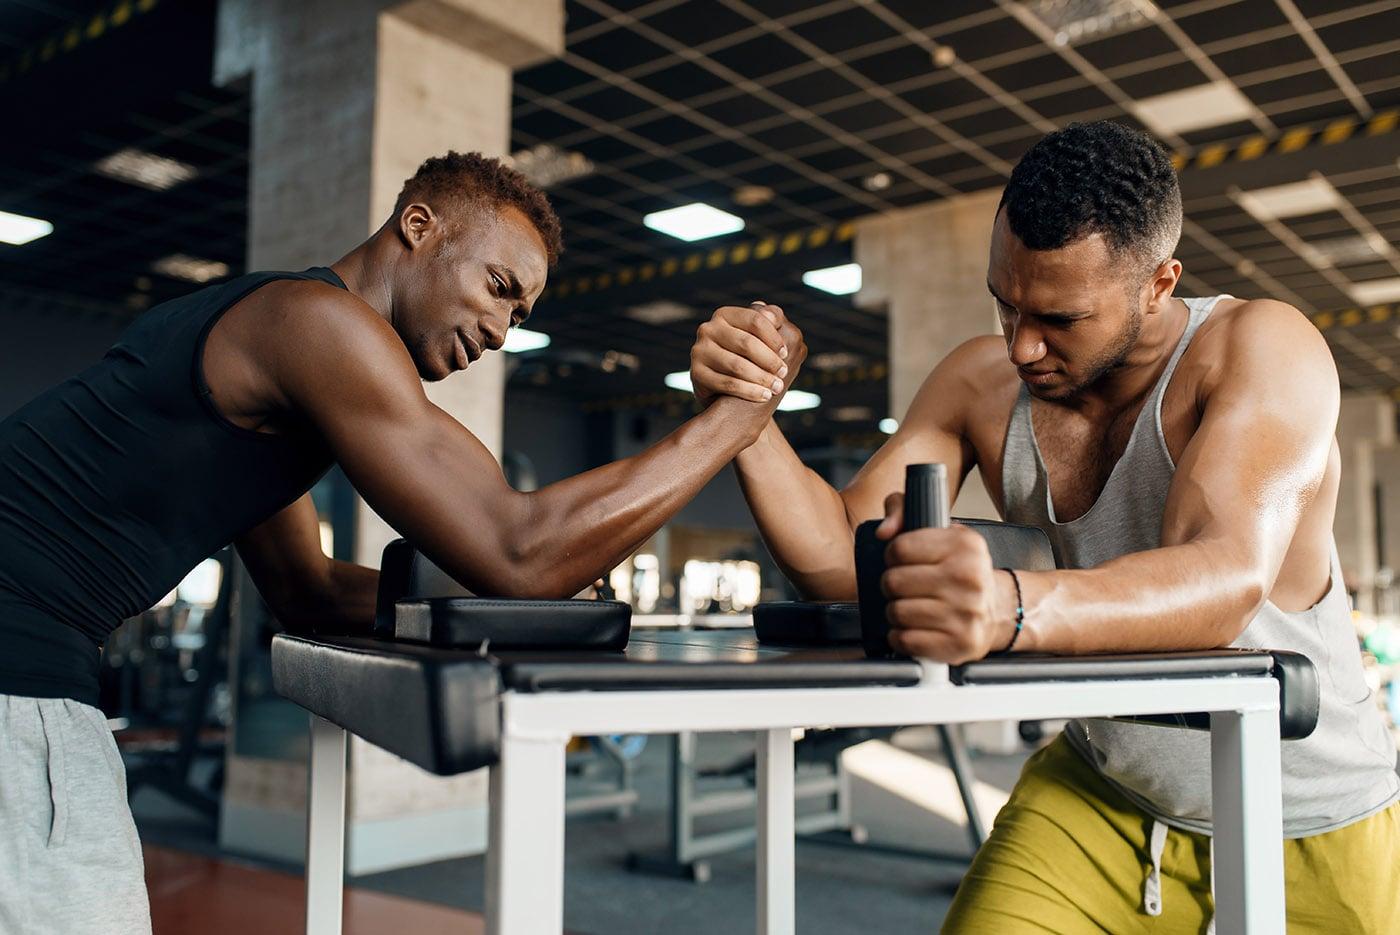 two-men-fighting-arm-wrestling-training-in-gym-CQ468DL-min.jpg